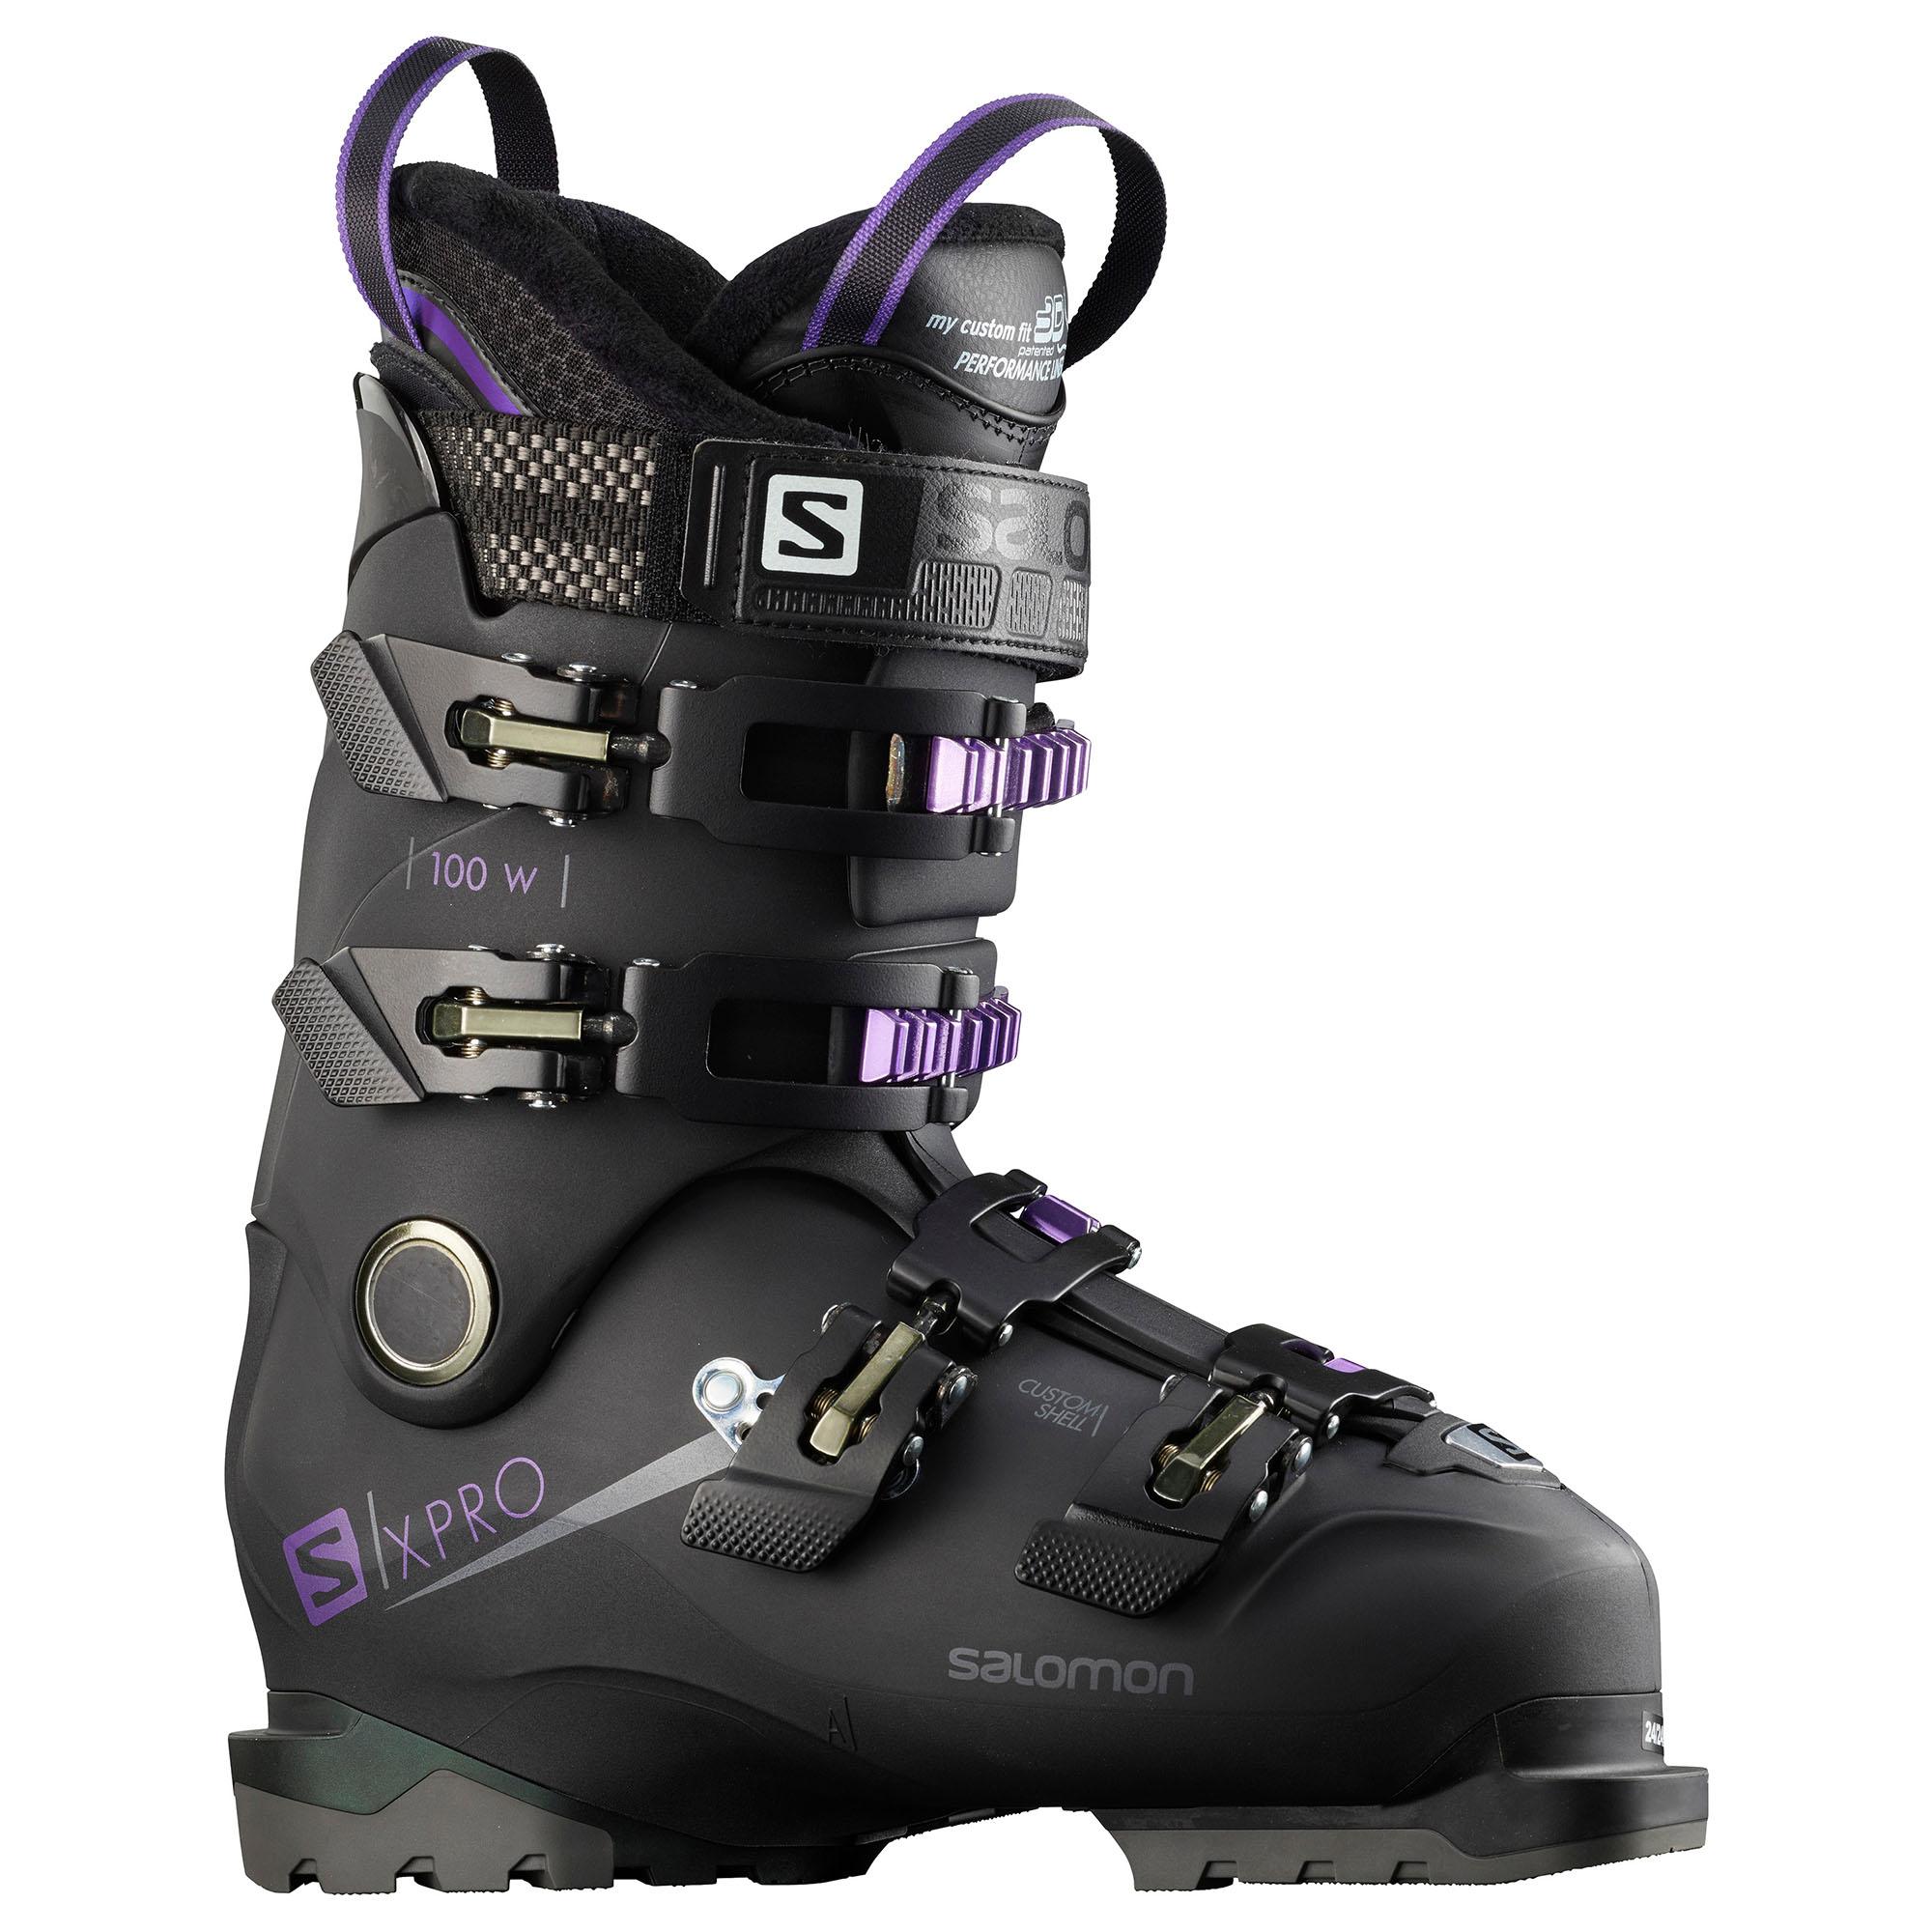 Salomon Women's X/pro 100 Ski Boots '19 -  00889645658131